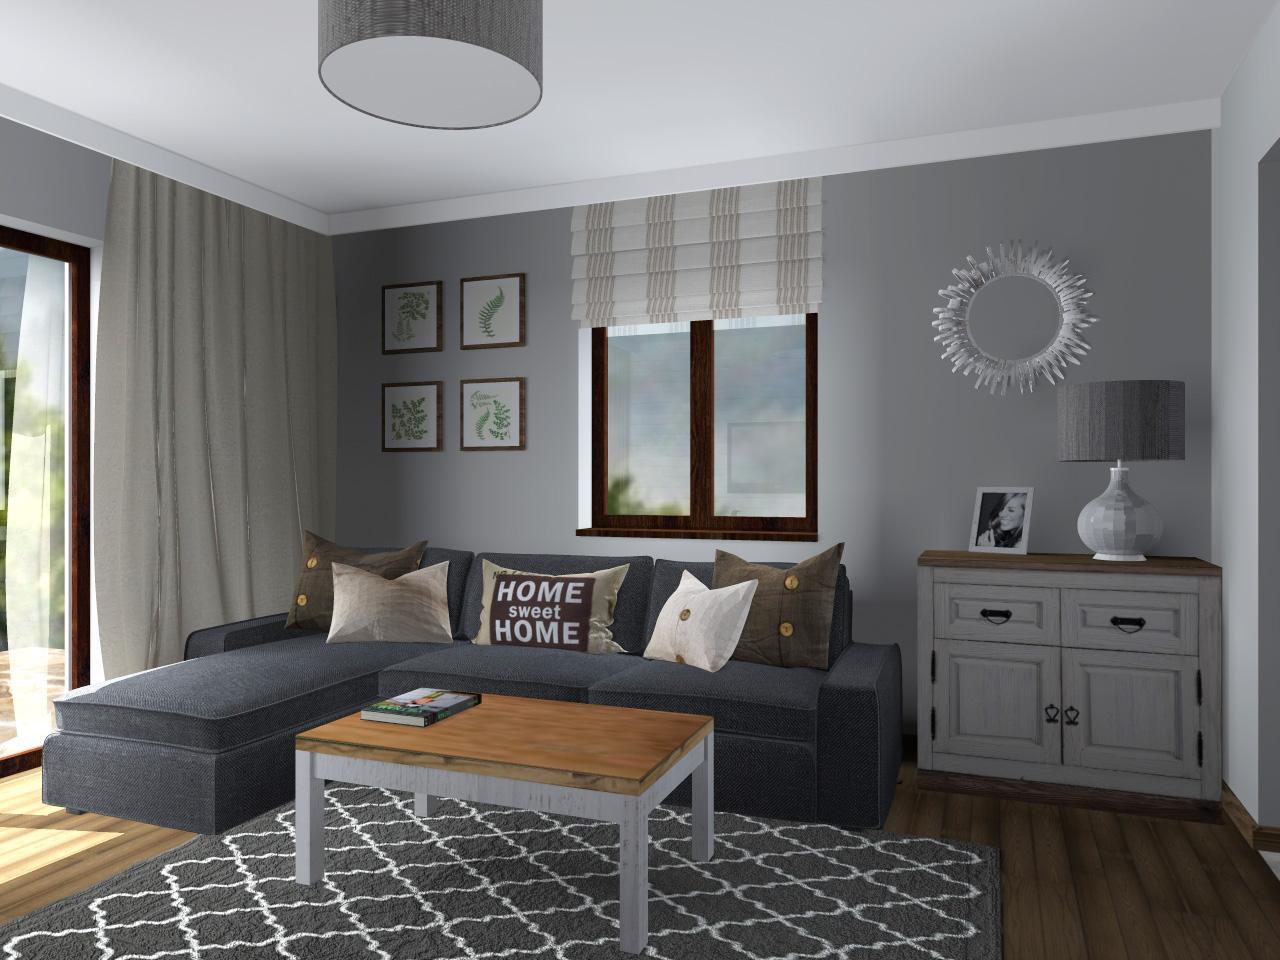 kuchnia i salon su kowice 30 m2. Black Bedroom Furniture Sets. Home Design Ideas